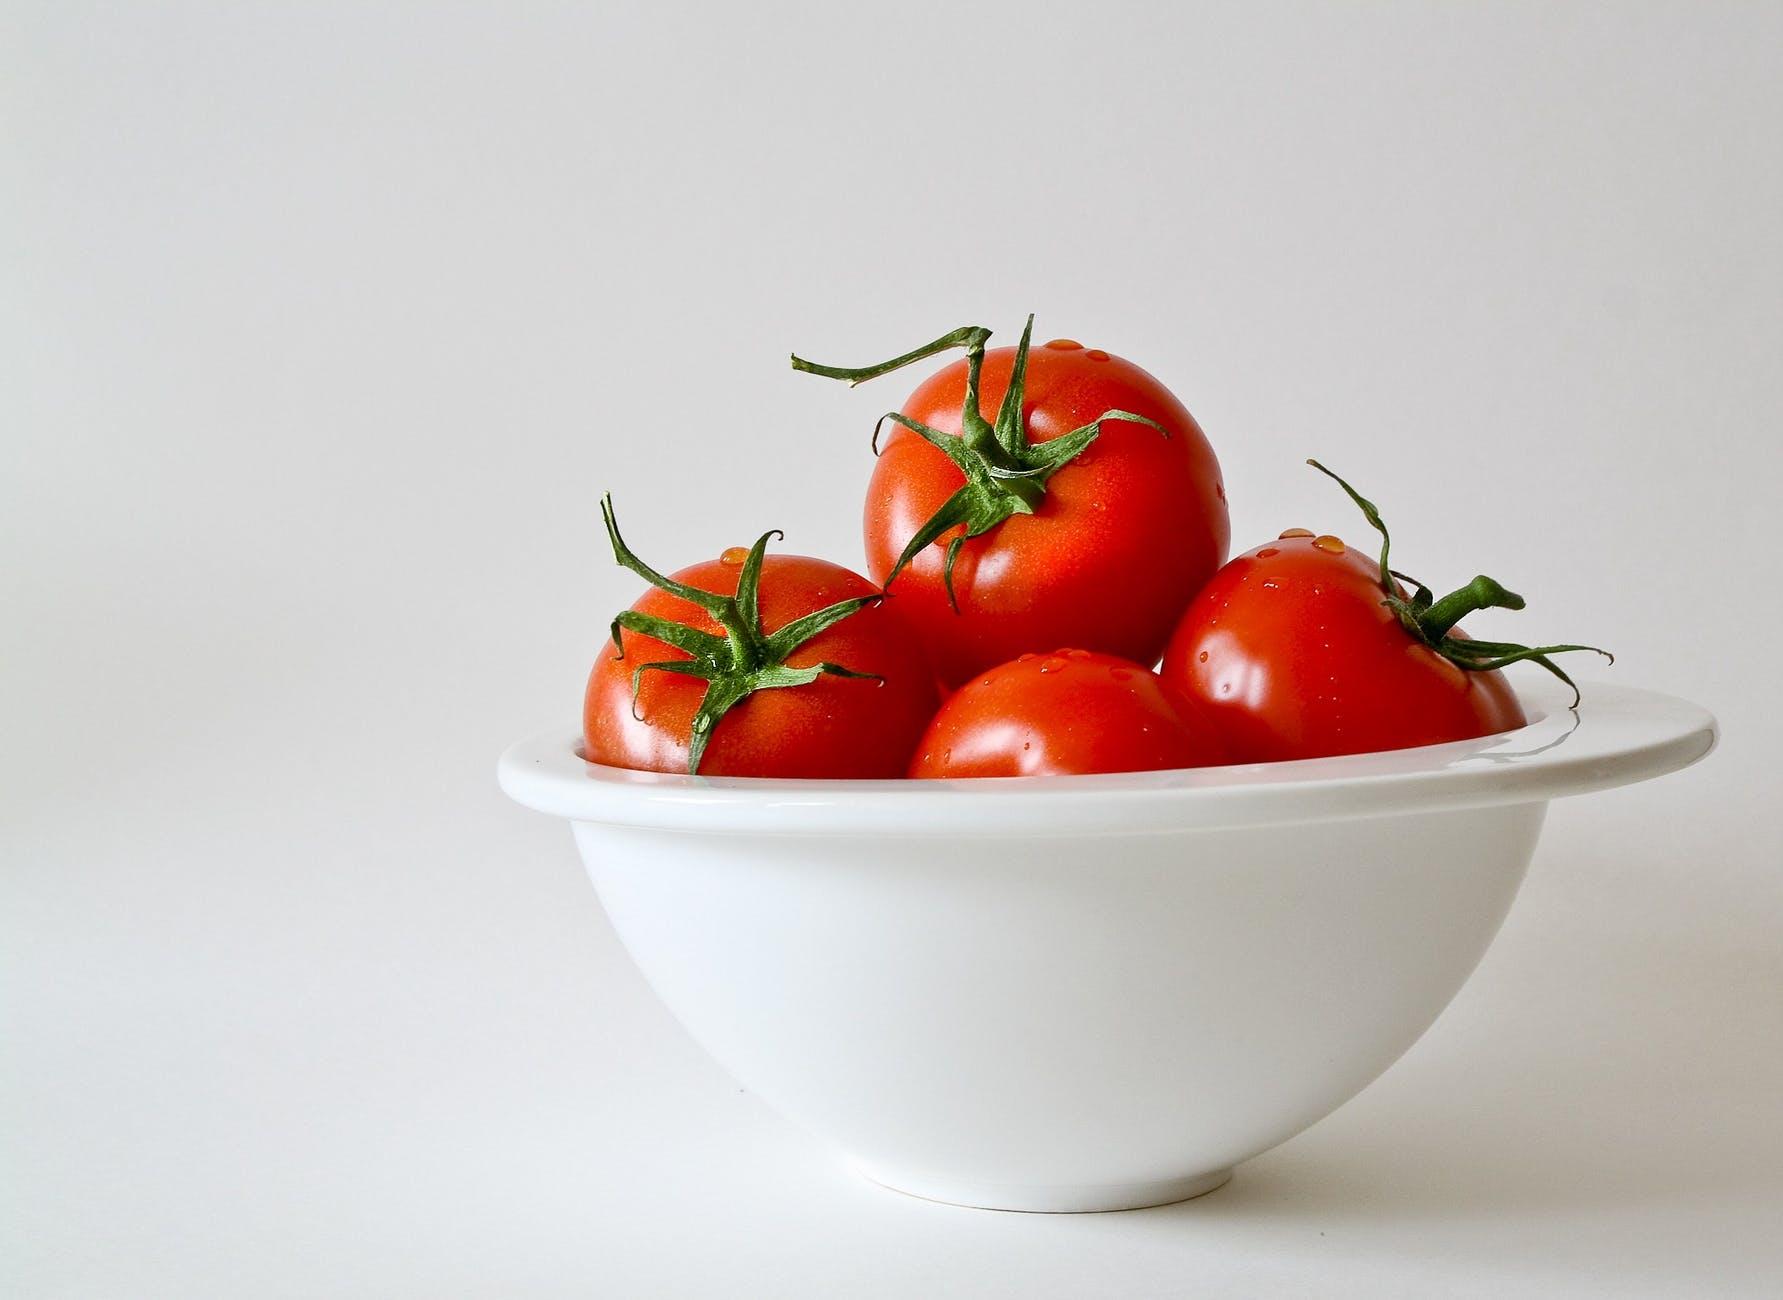 food vegetables red tomatoes